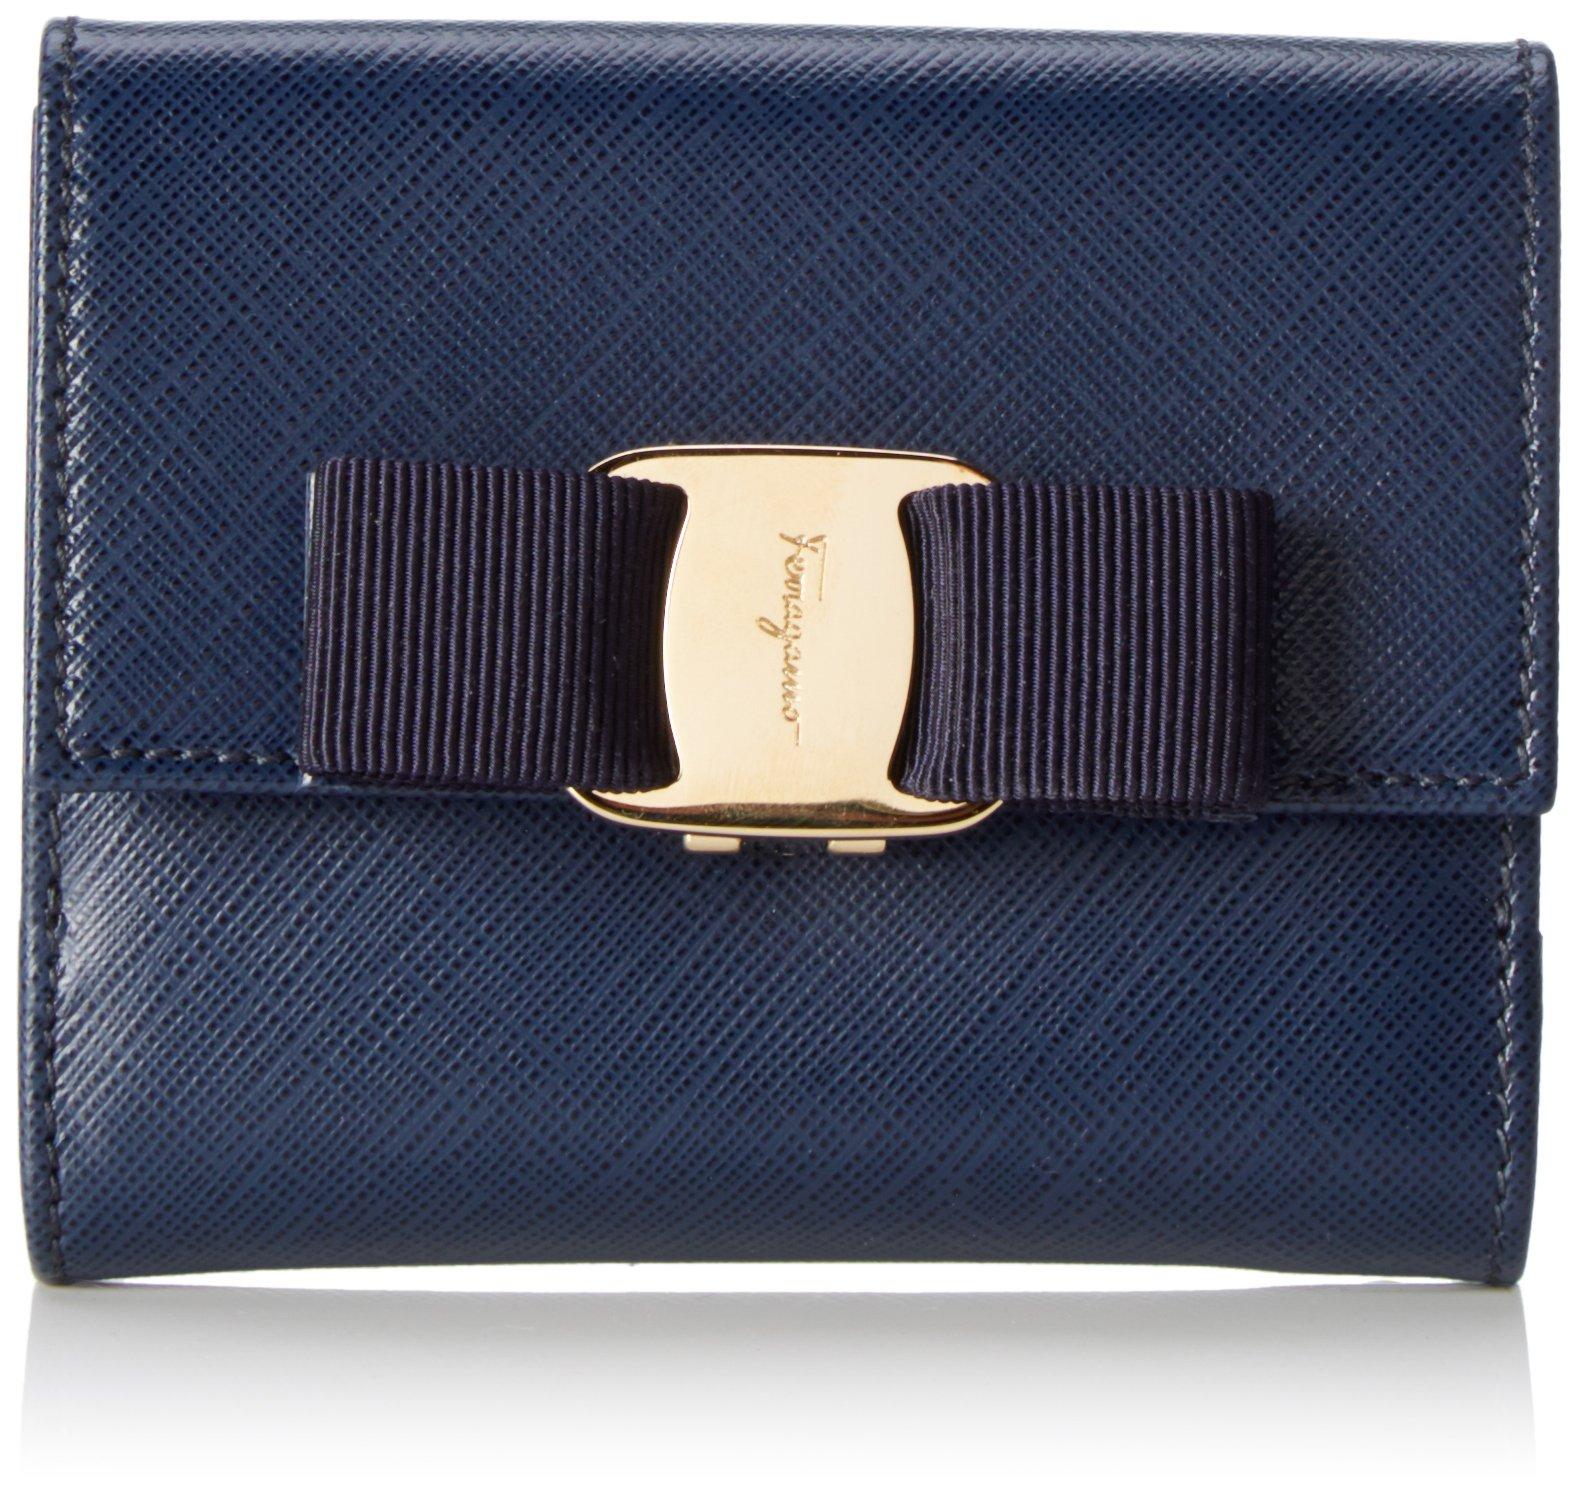 Salvatore Ferragamo Women's Vara Mini Wallet 560786, Navy One Size